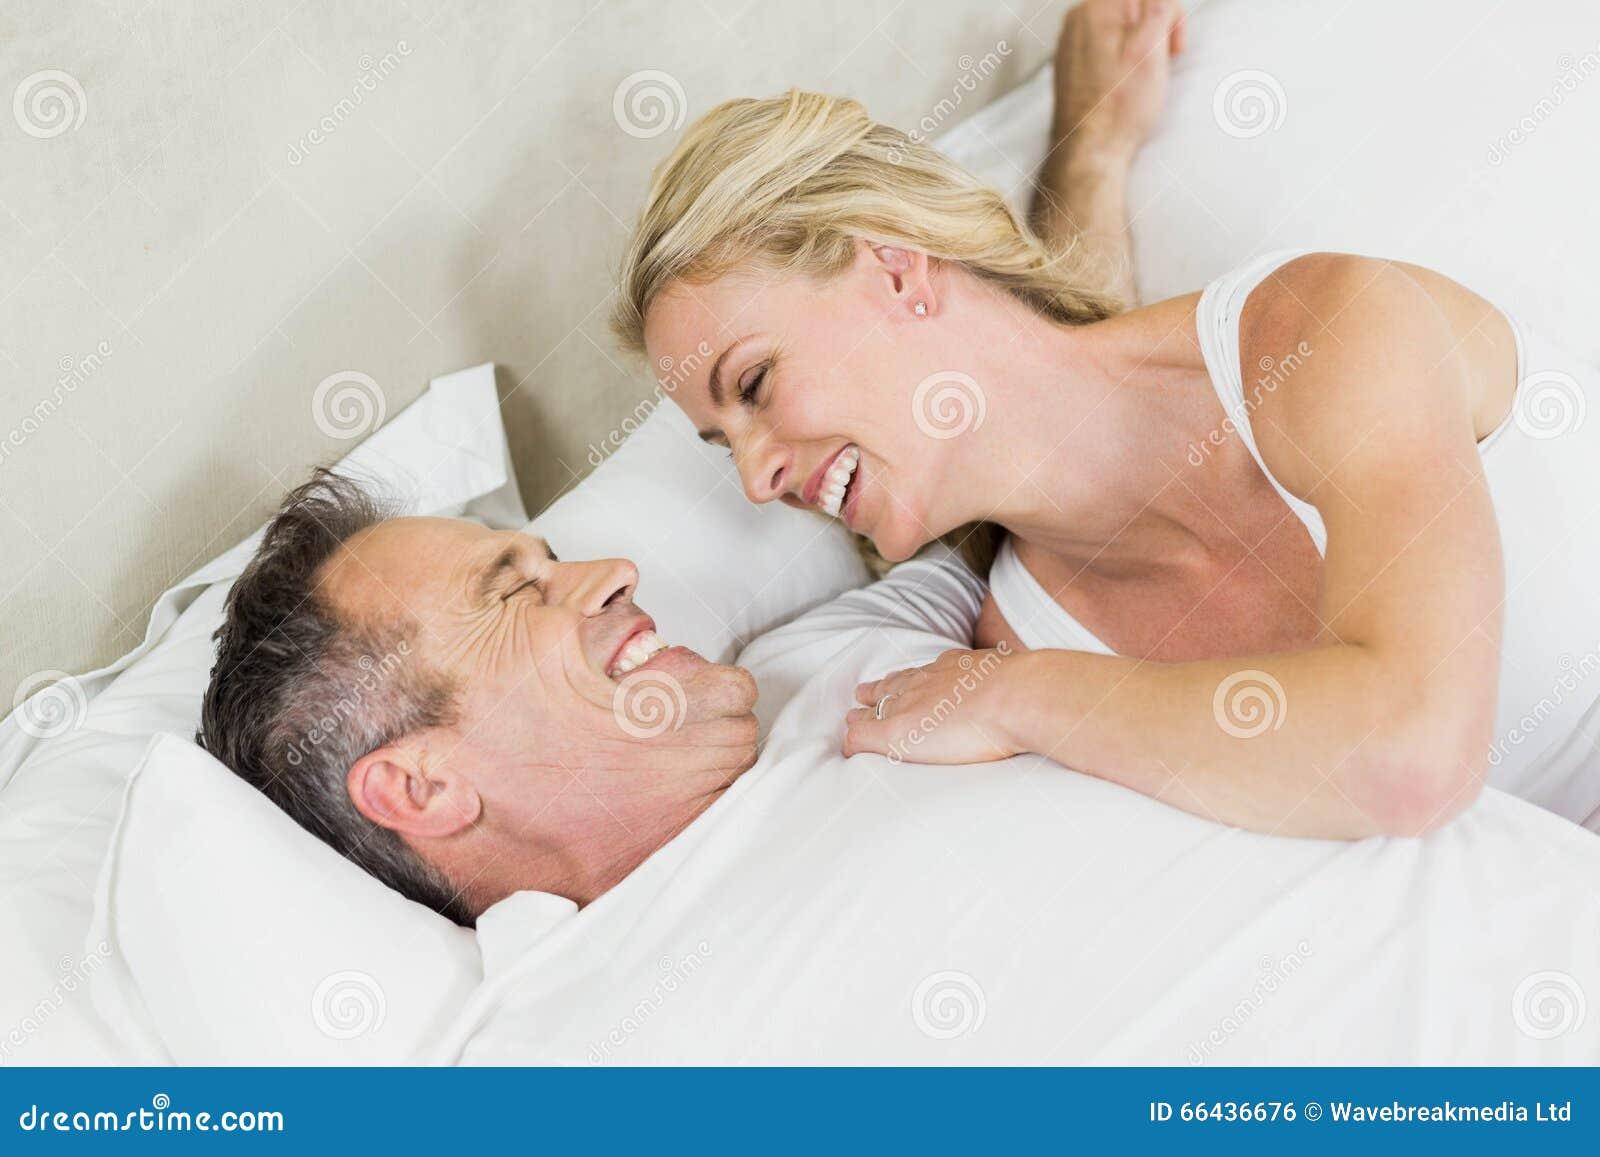 Make My Hospital Bed Pretty